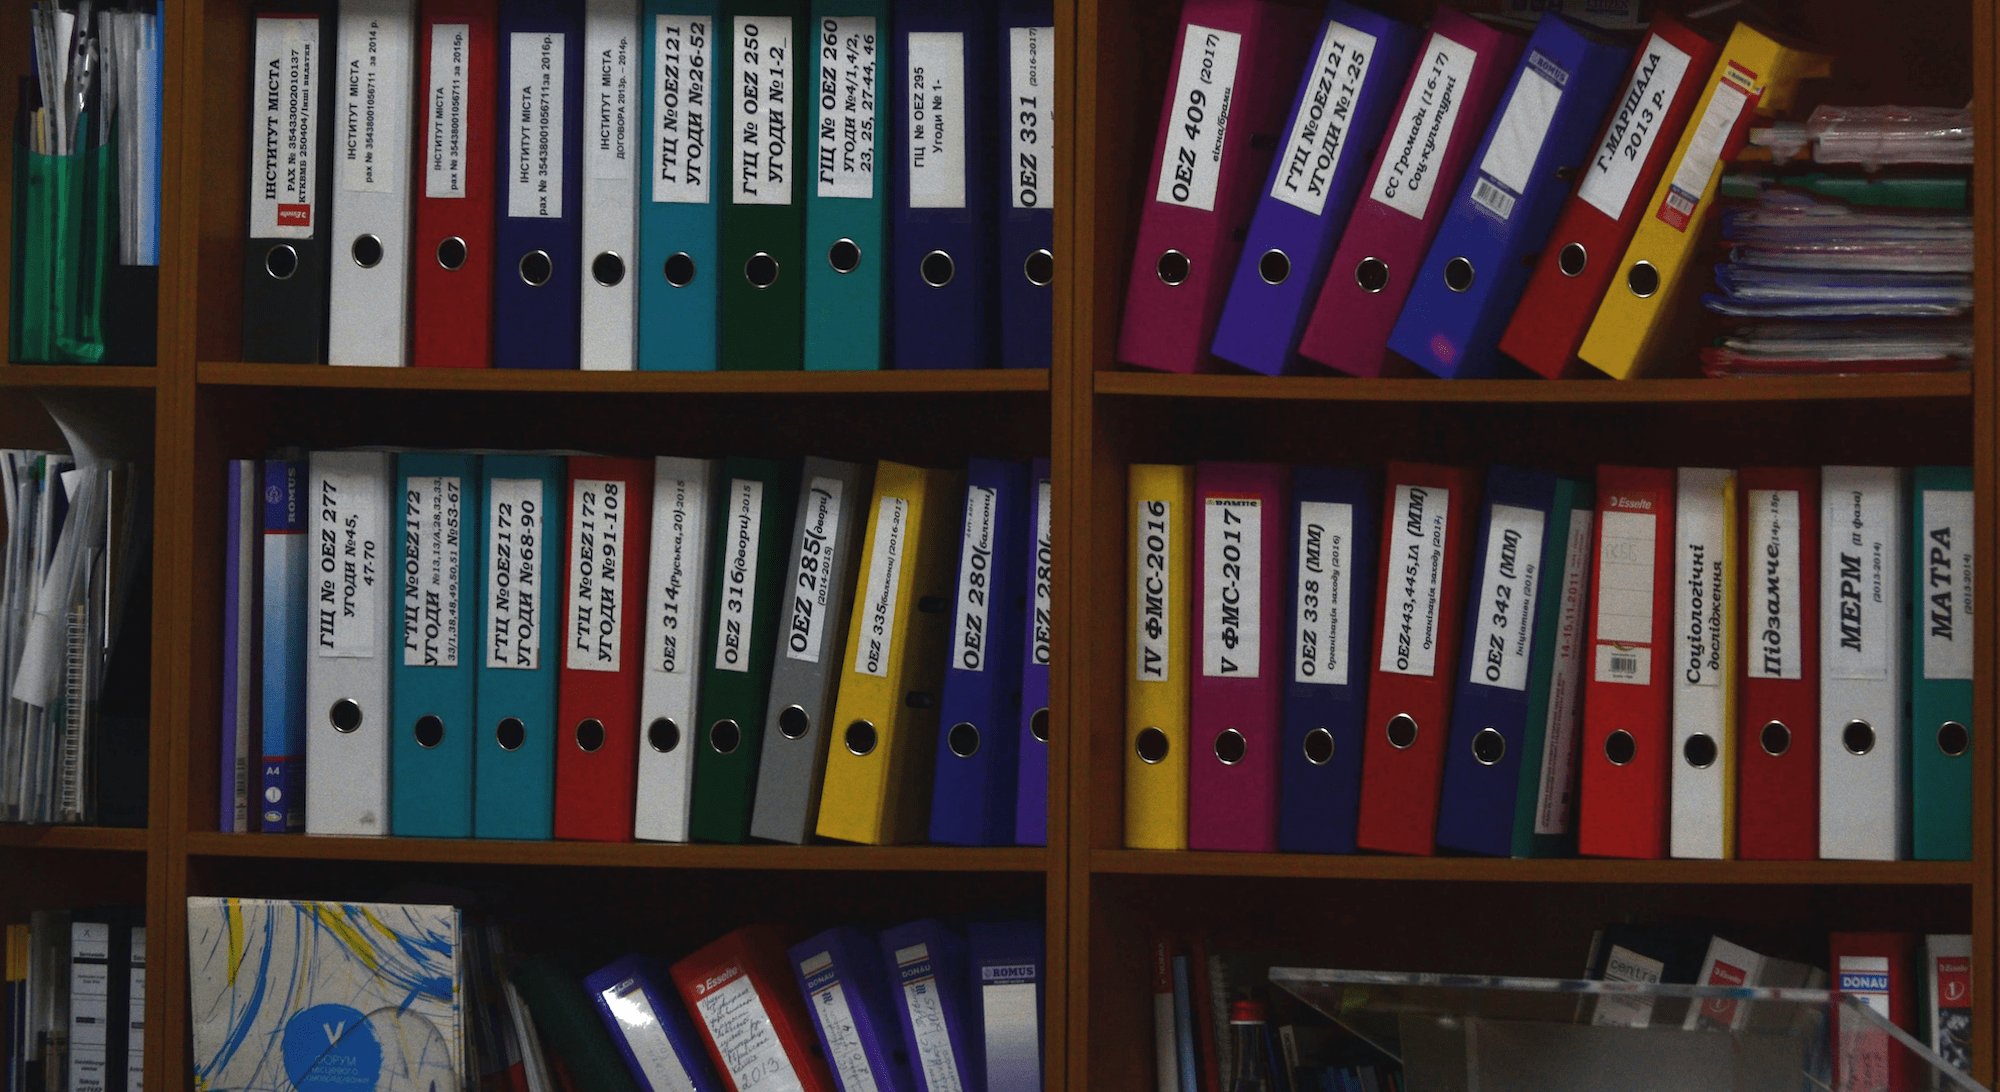 documents on the shelf